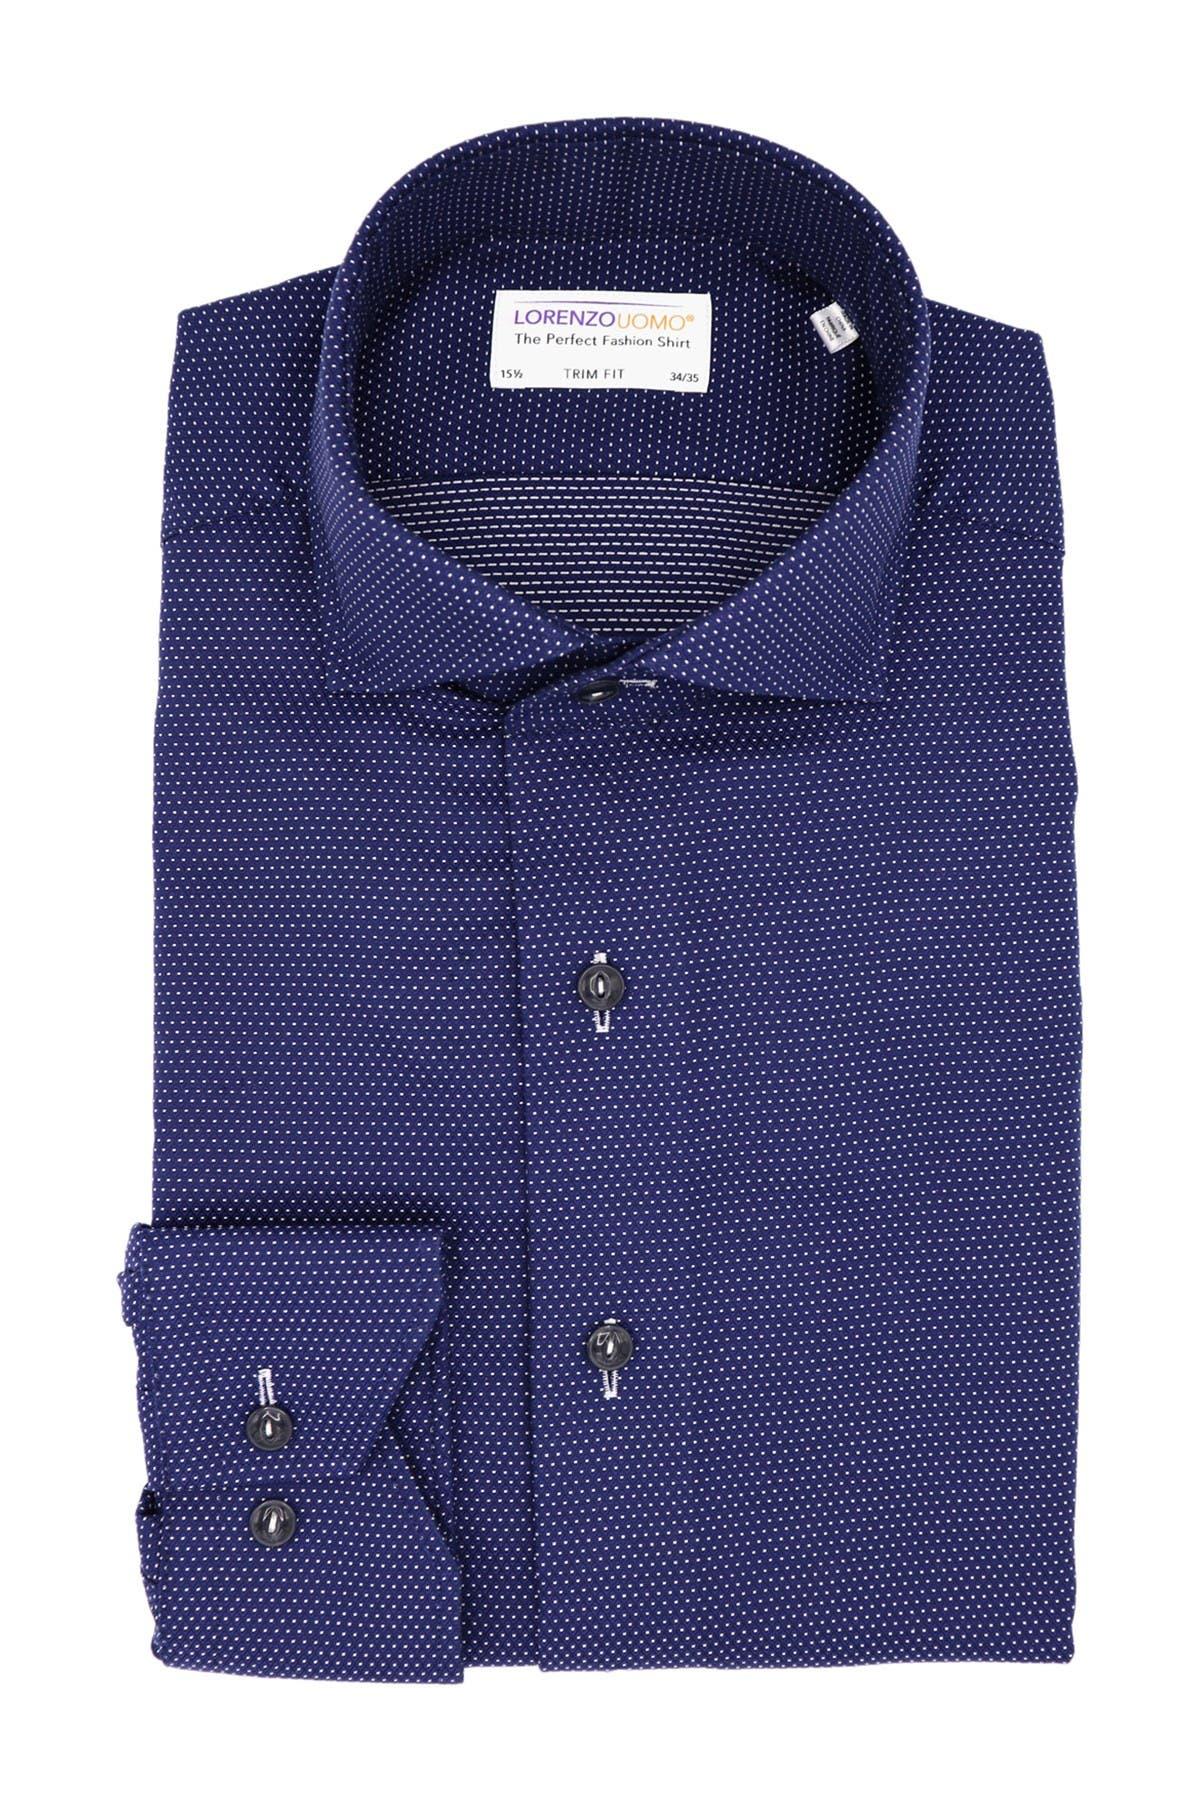 Lorenzo Uomo 100/% Cotton Navy Trim Fit Geometric Dress Shirt Size 16.5 32//33